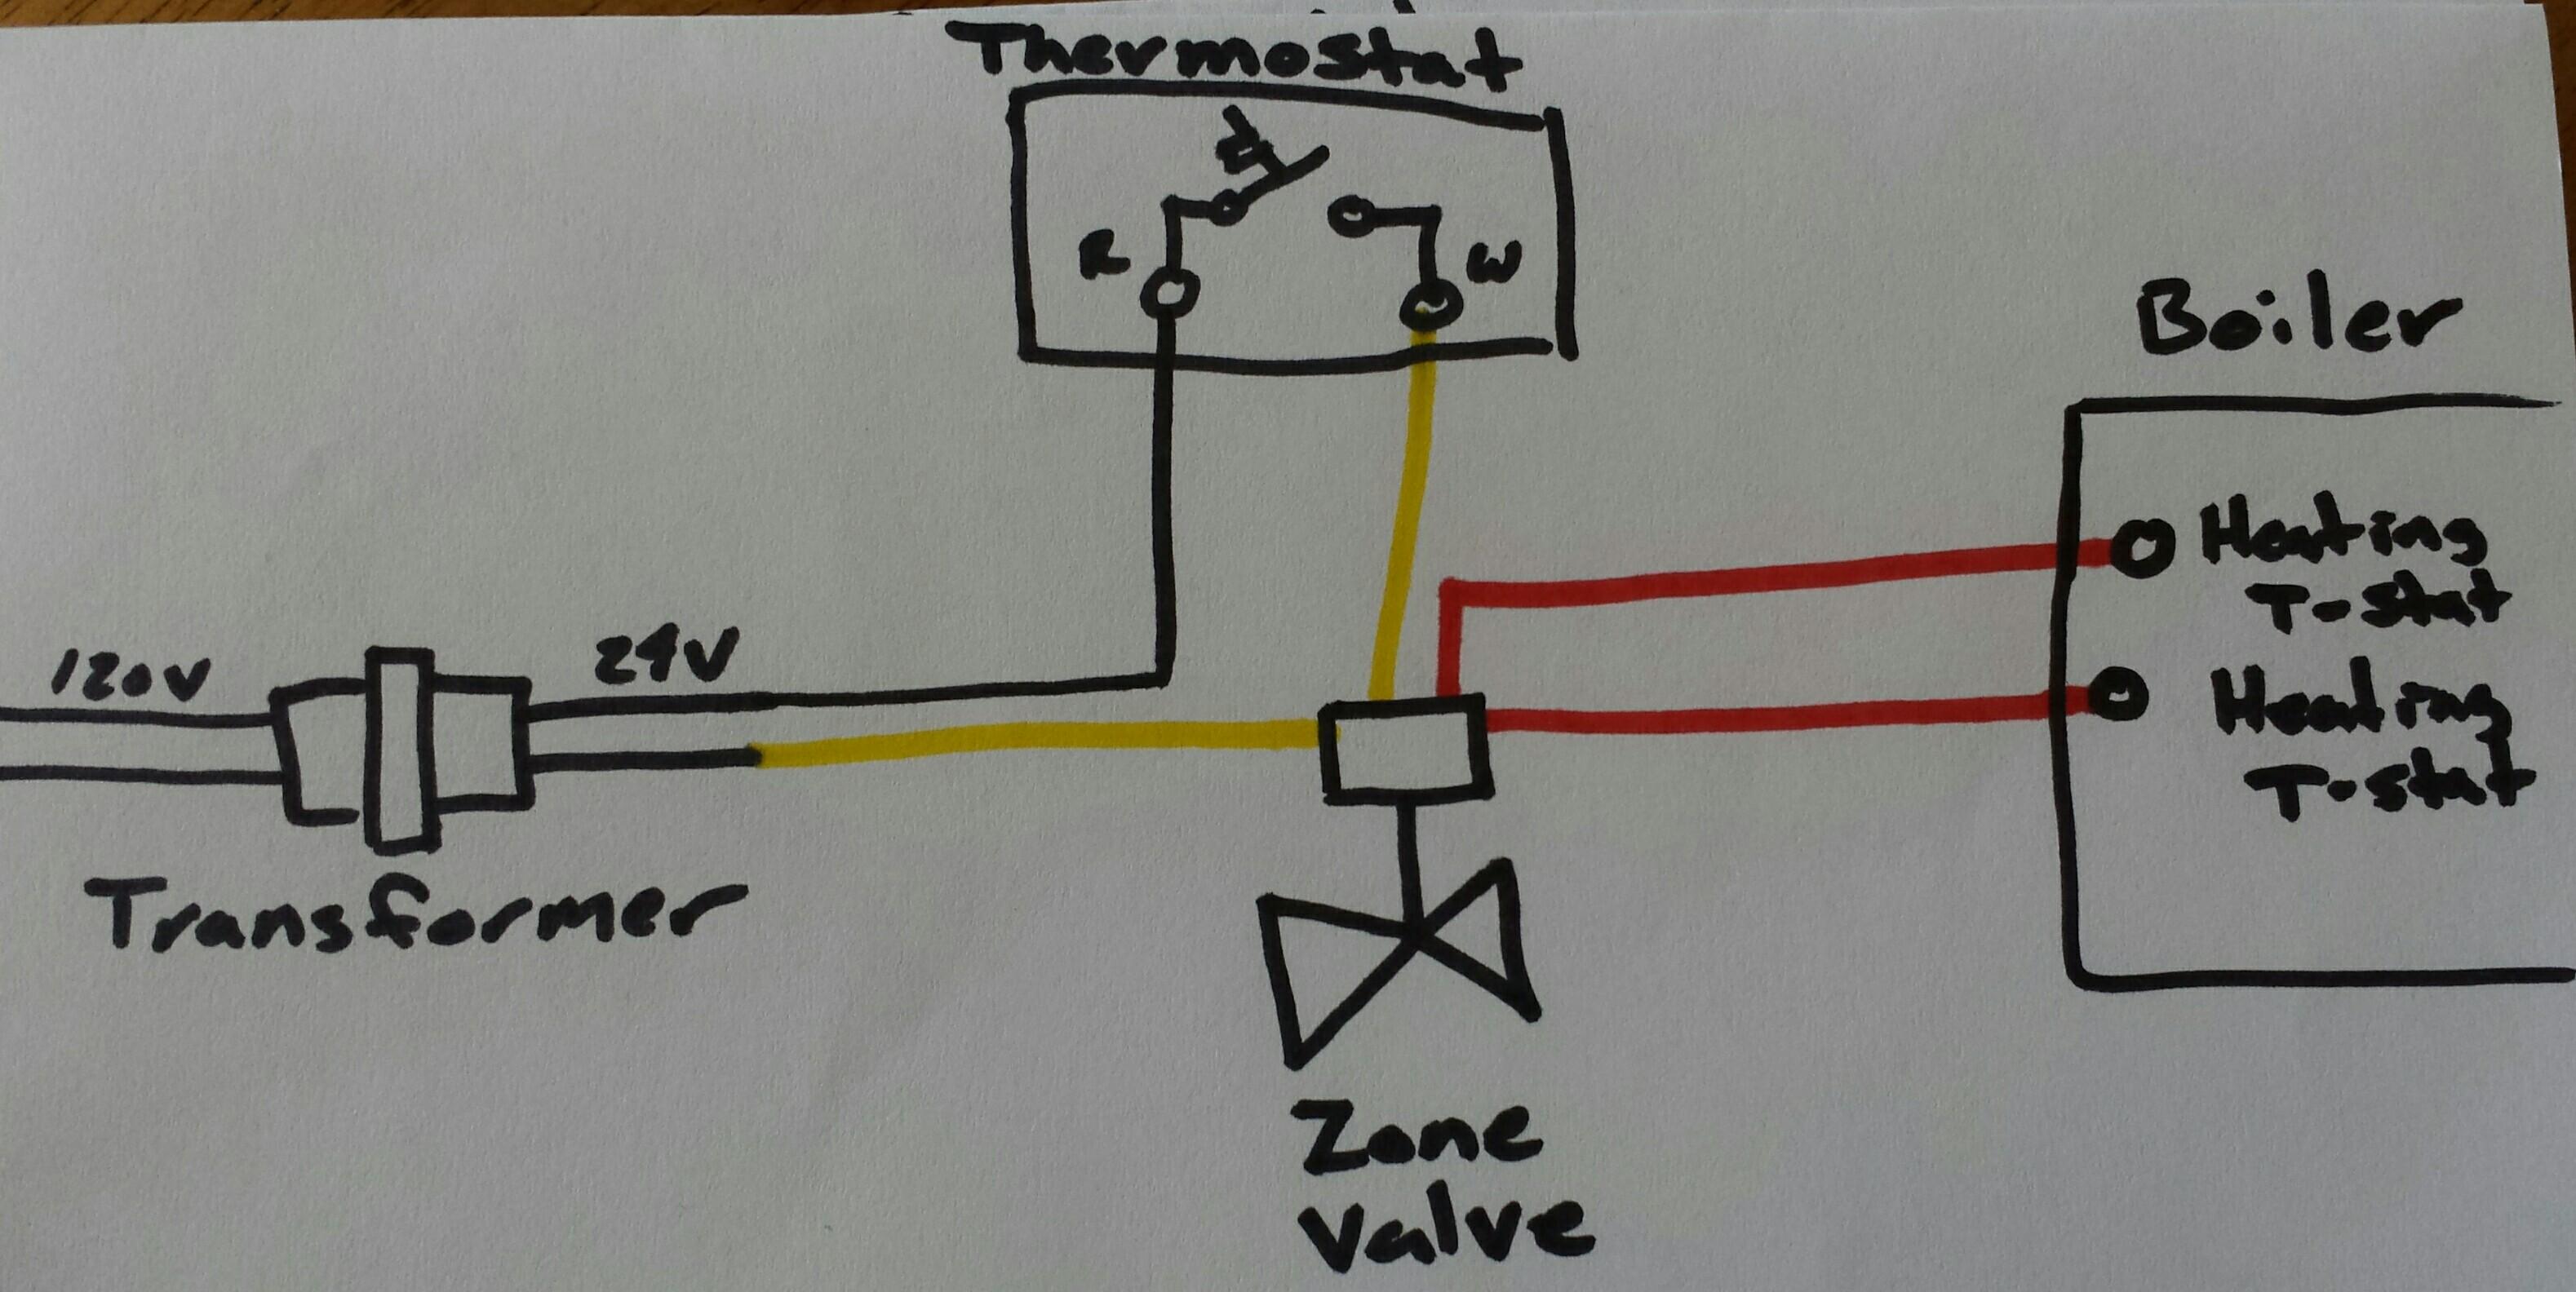 Triple Acting Aquastat Wiring Diagrams Free Diagram For You Boiler Scematic Rh 69 Jessicadonath De Relay Type L8148e